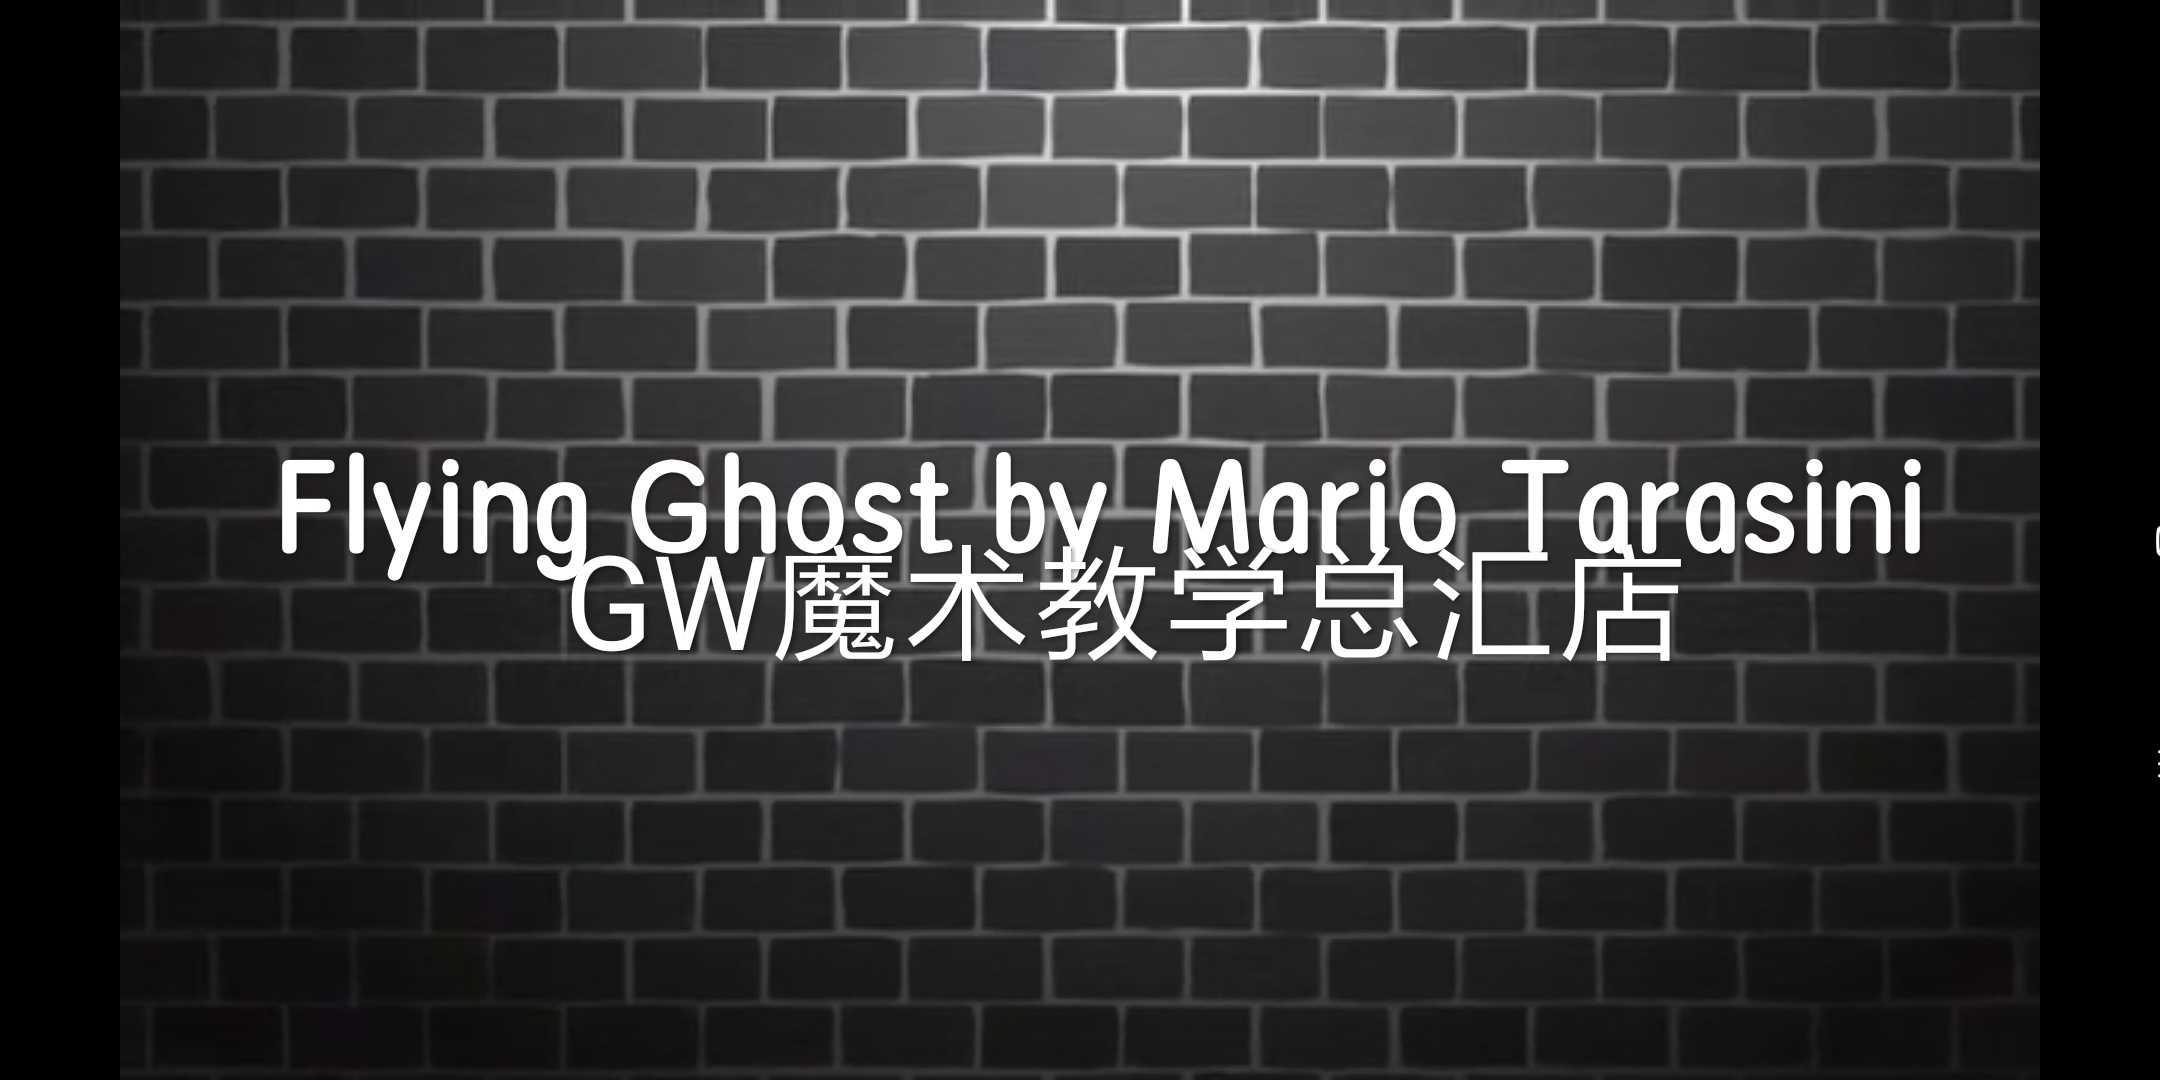 2020 fantasma volador de Mario Tarasini, trucos de magia